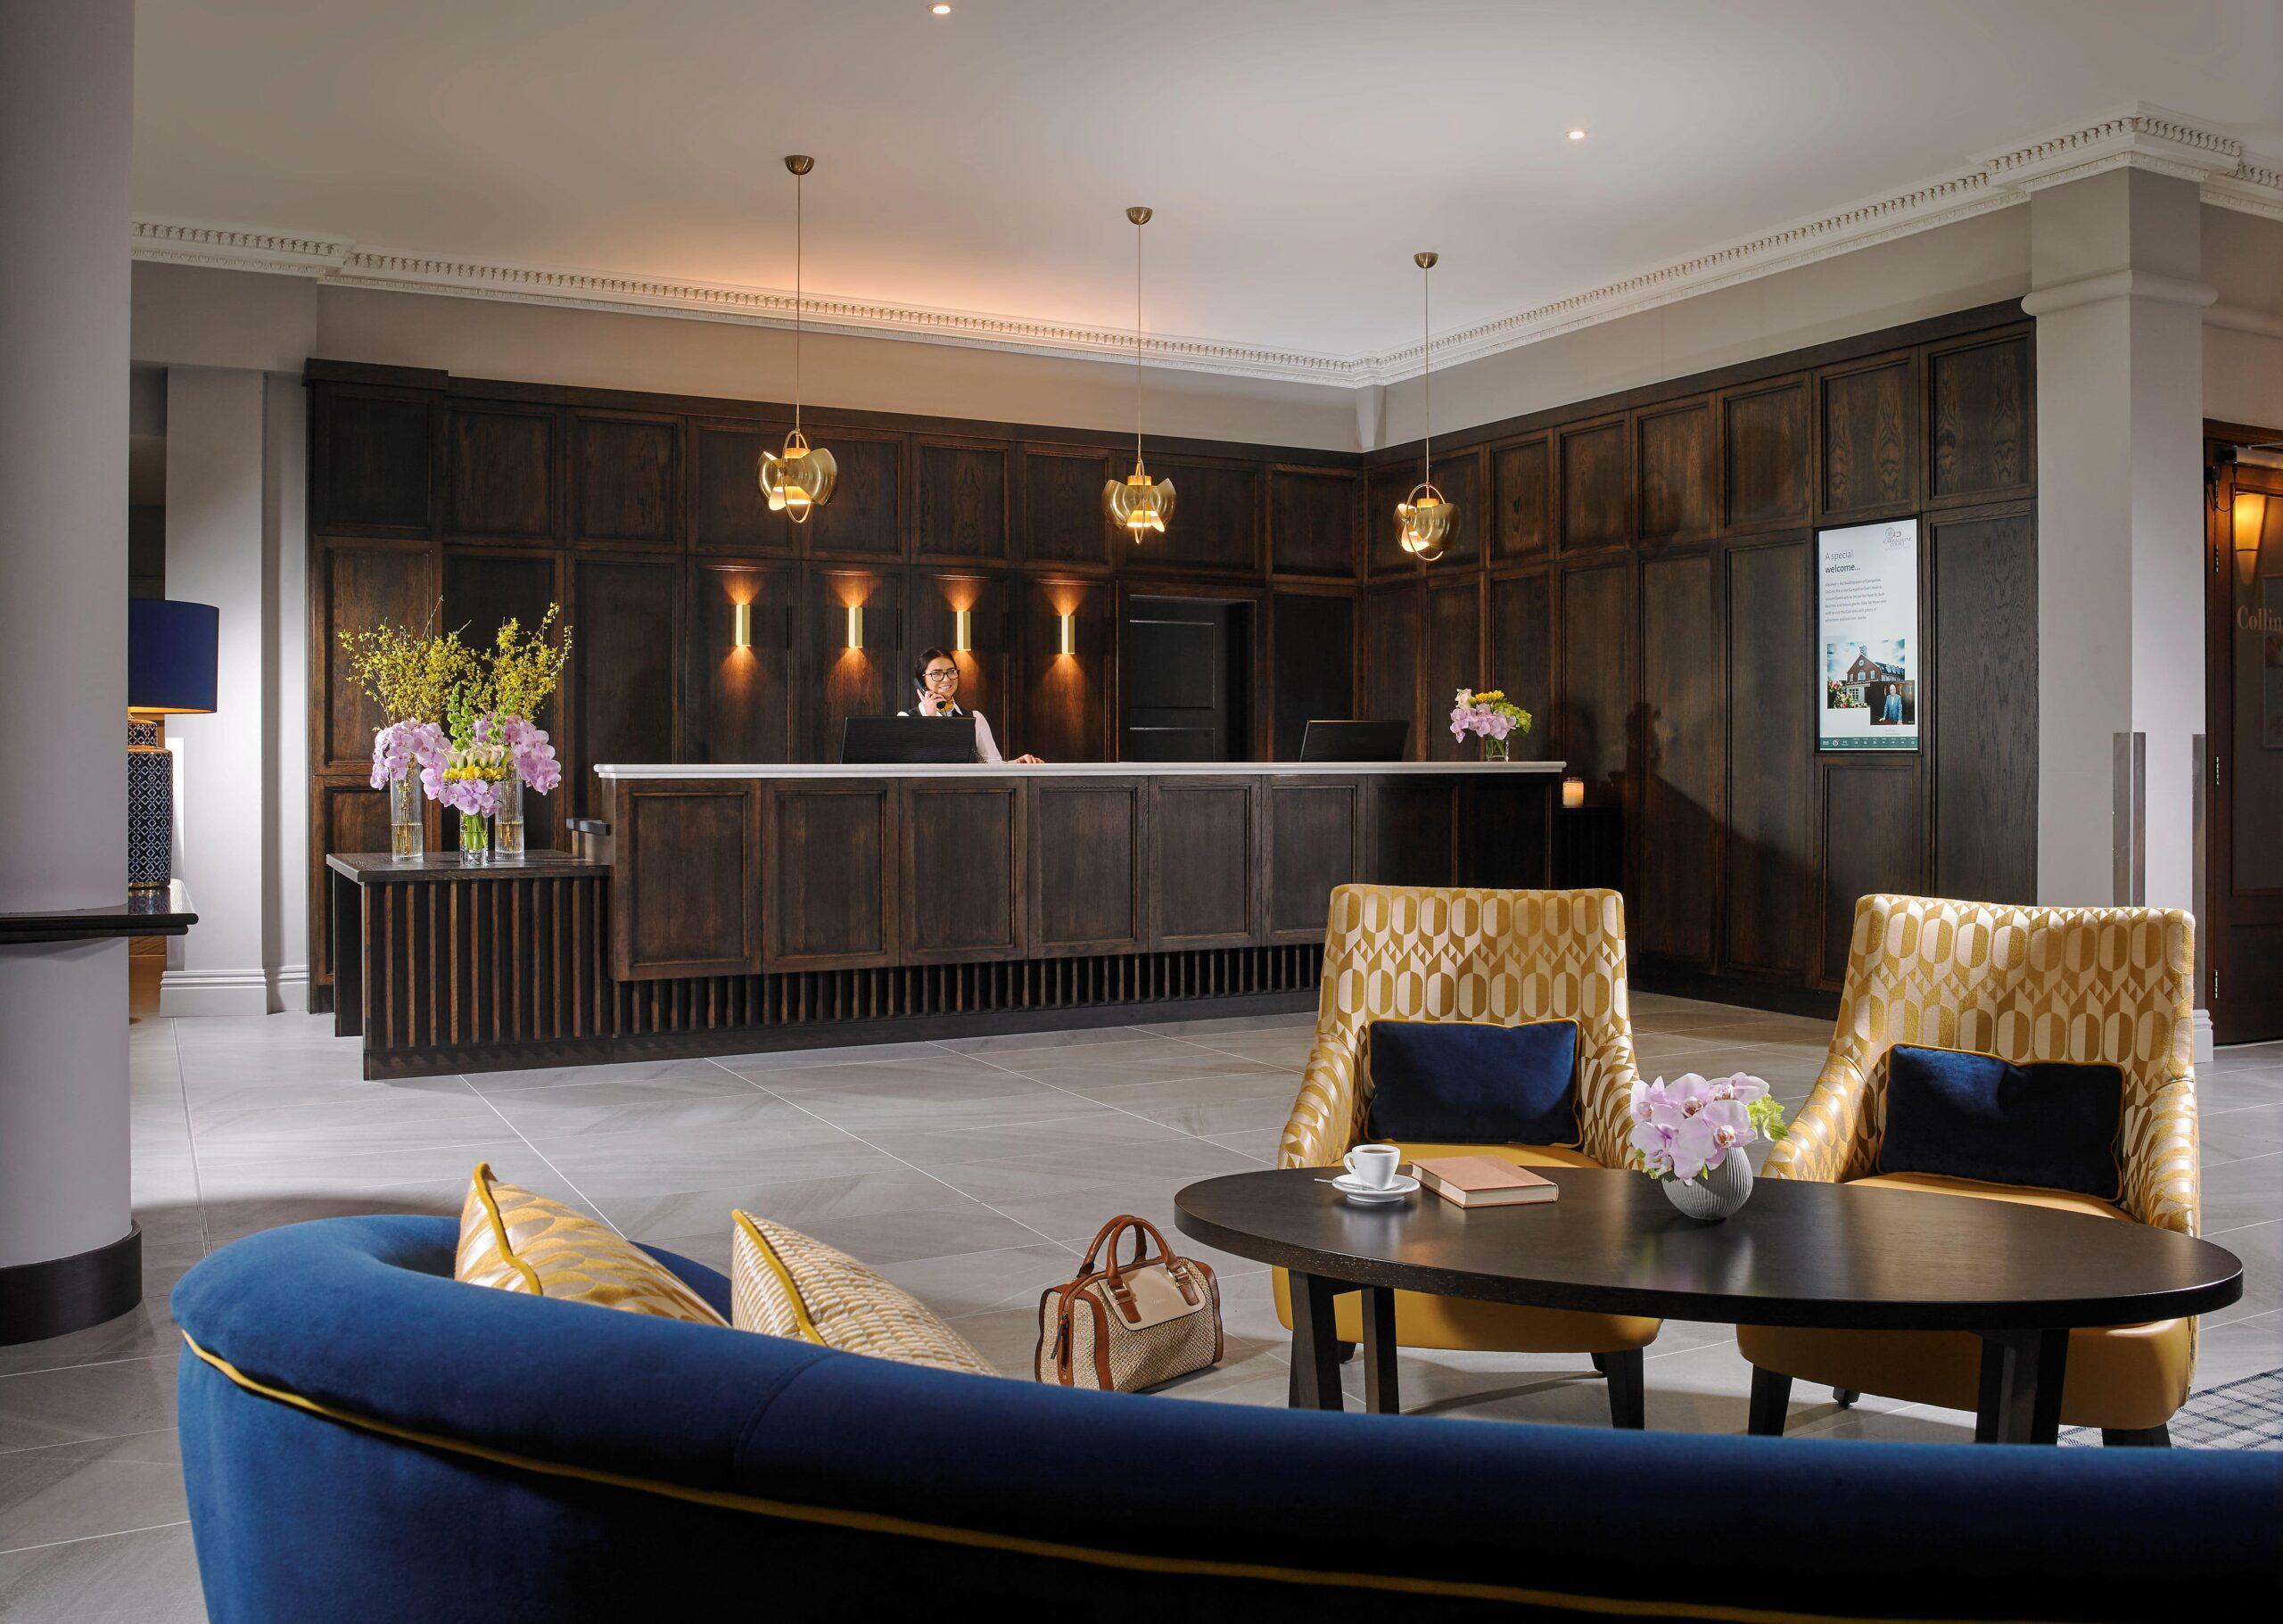 Carrigaline Court Hotel luxury near kinsale ireland